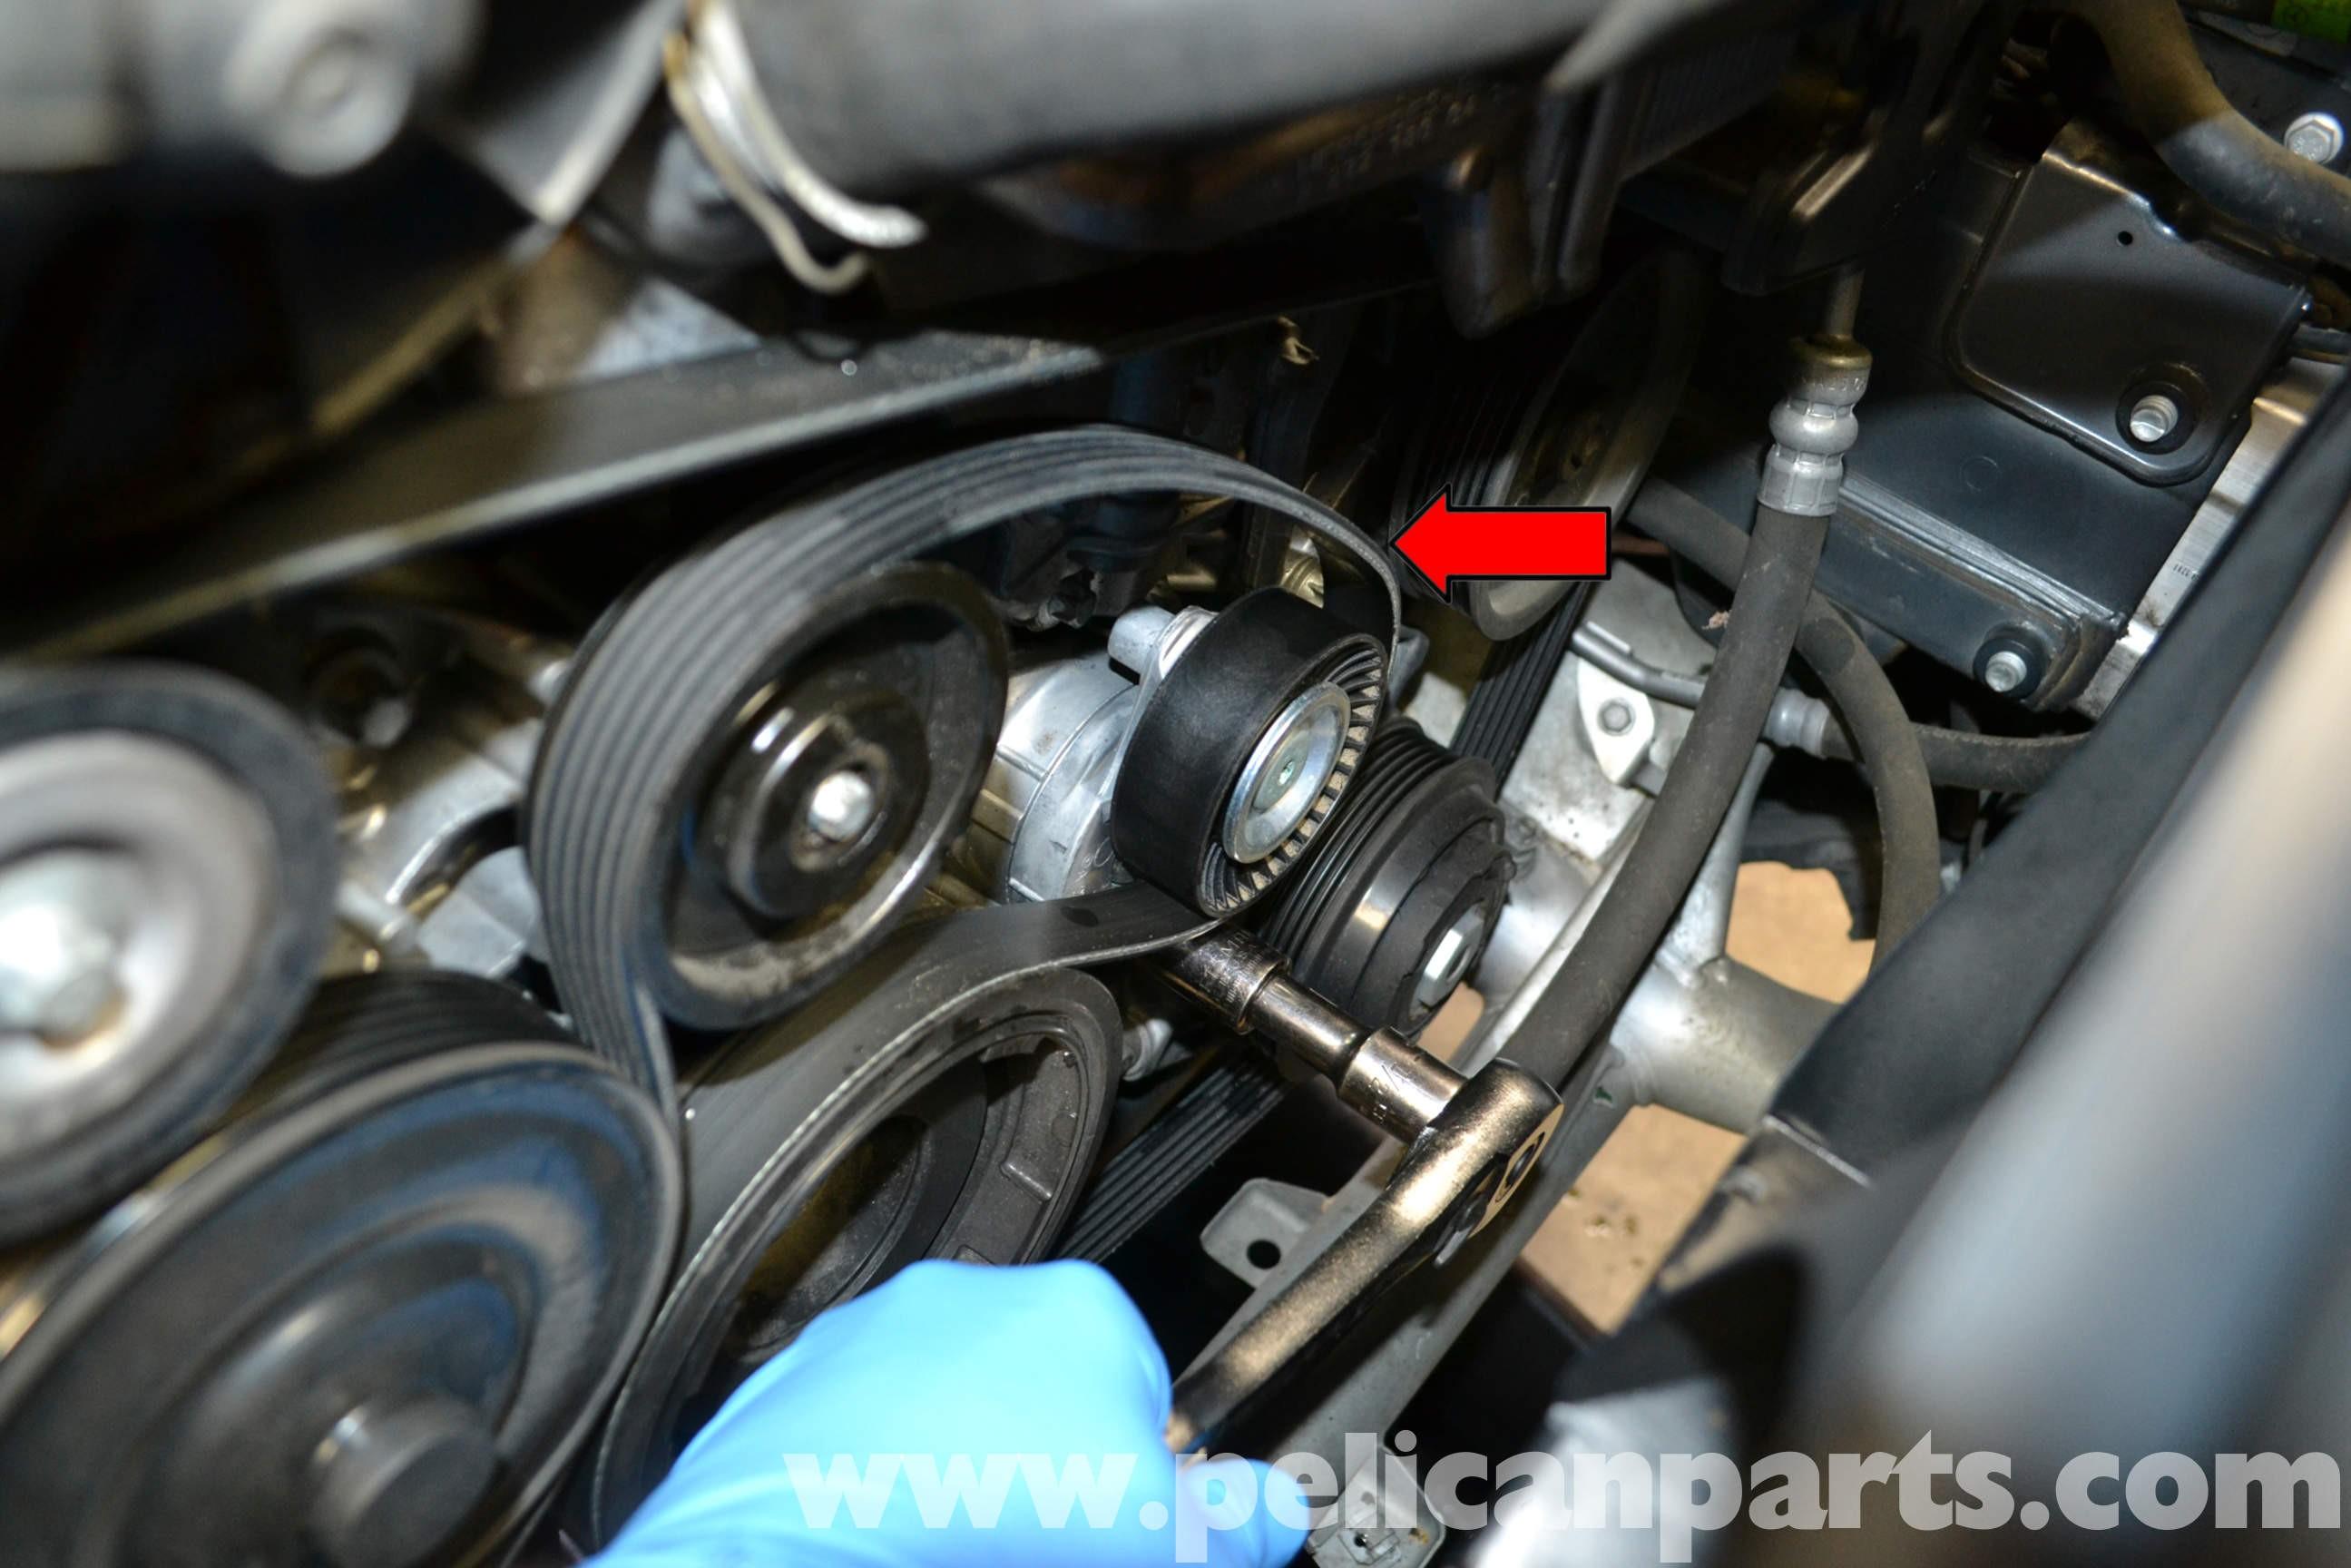 Diagram Of Car thermostat Mercedes Benz W204 thermostat Replacement 2008 2014 C250 C300 Of Diagram Of Car thermostat